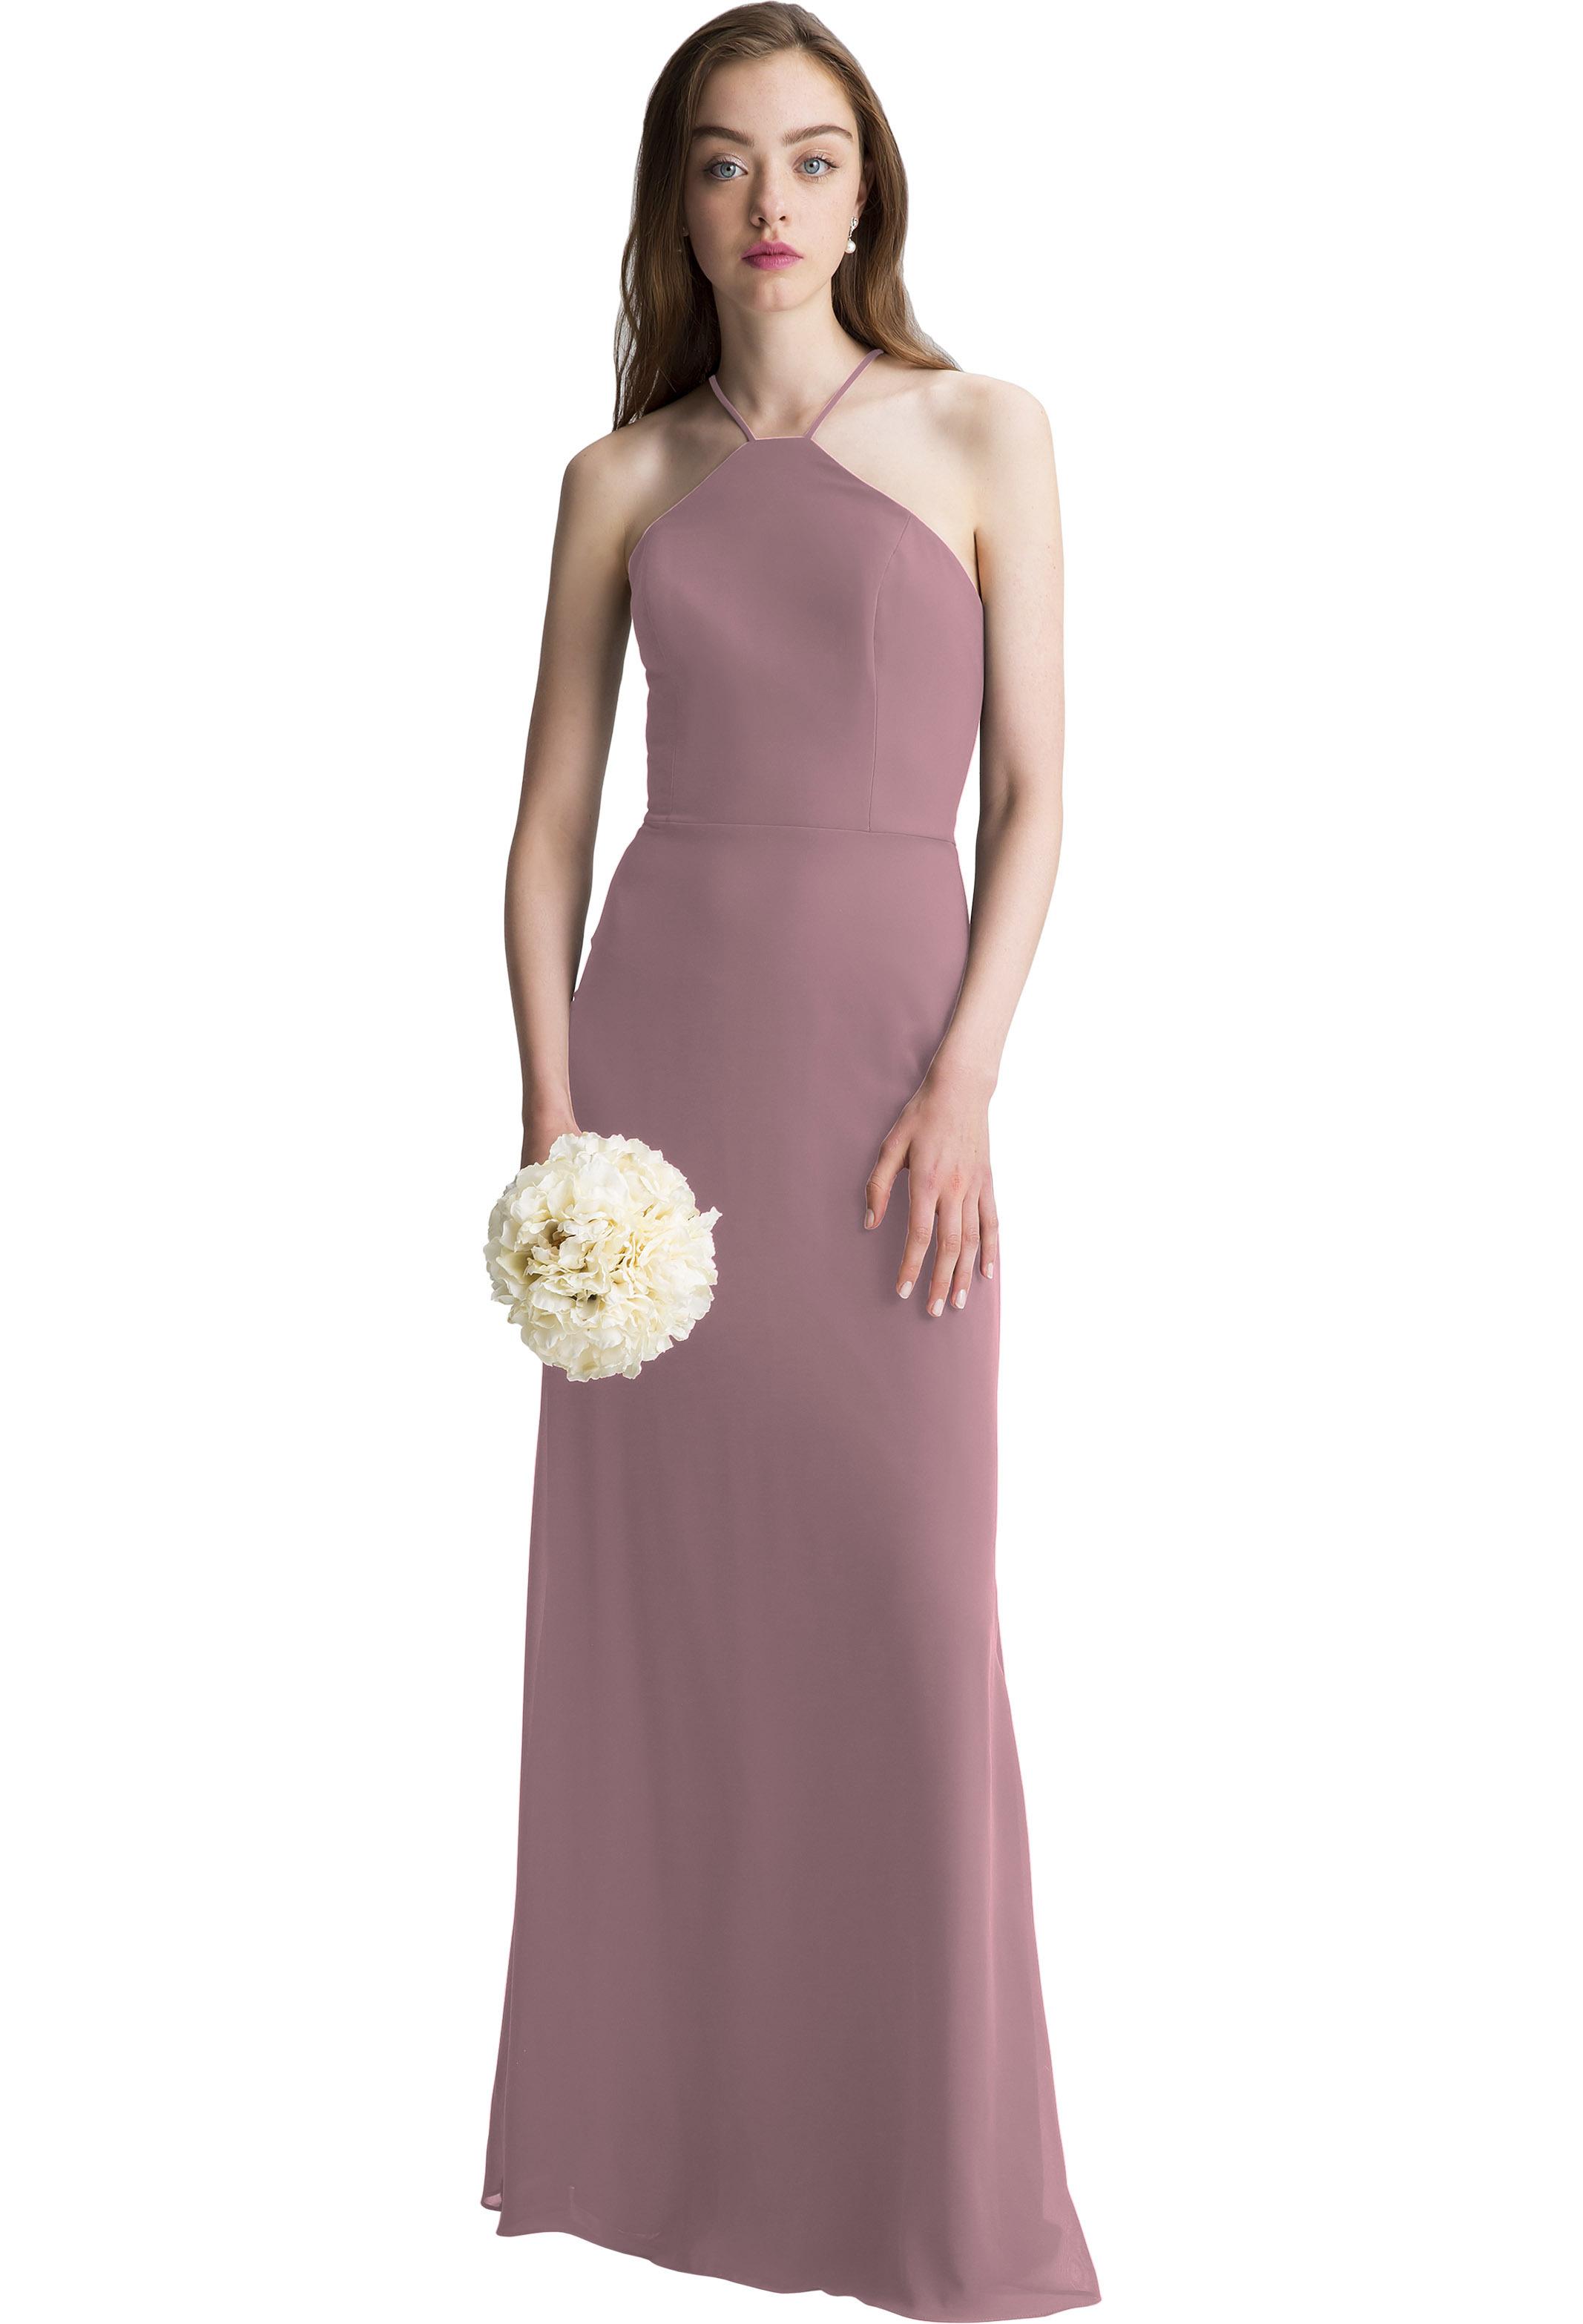 Bill Levkoff WISTERIA Chiffon Halter A-line gown, $150.00 Front